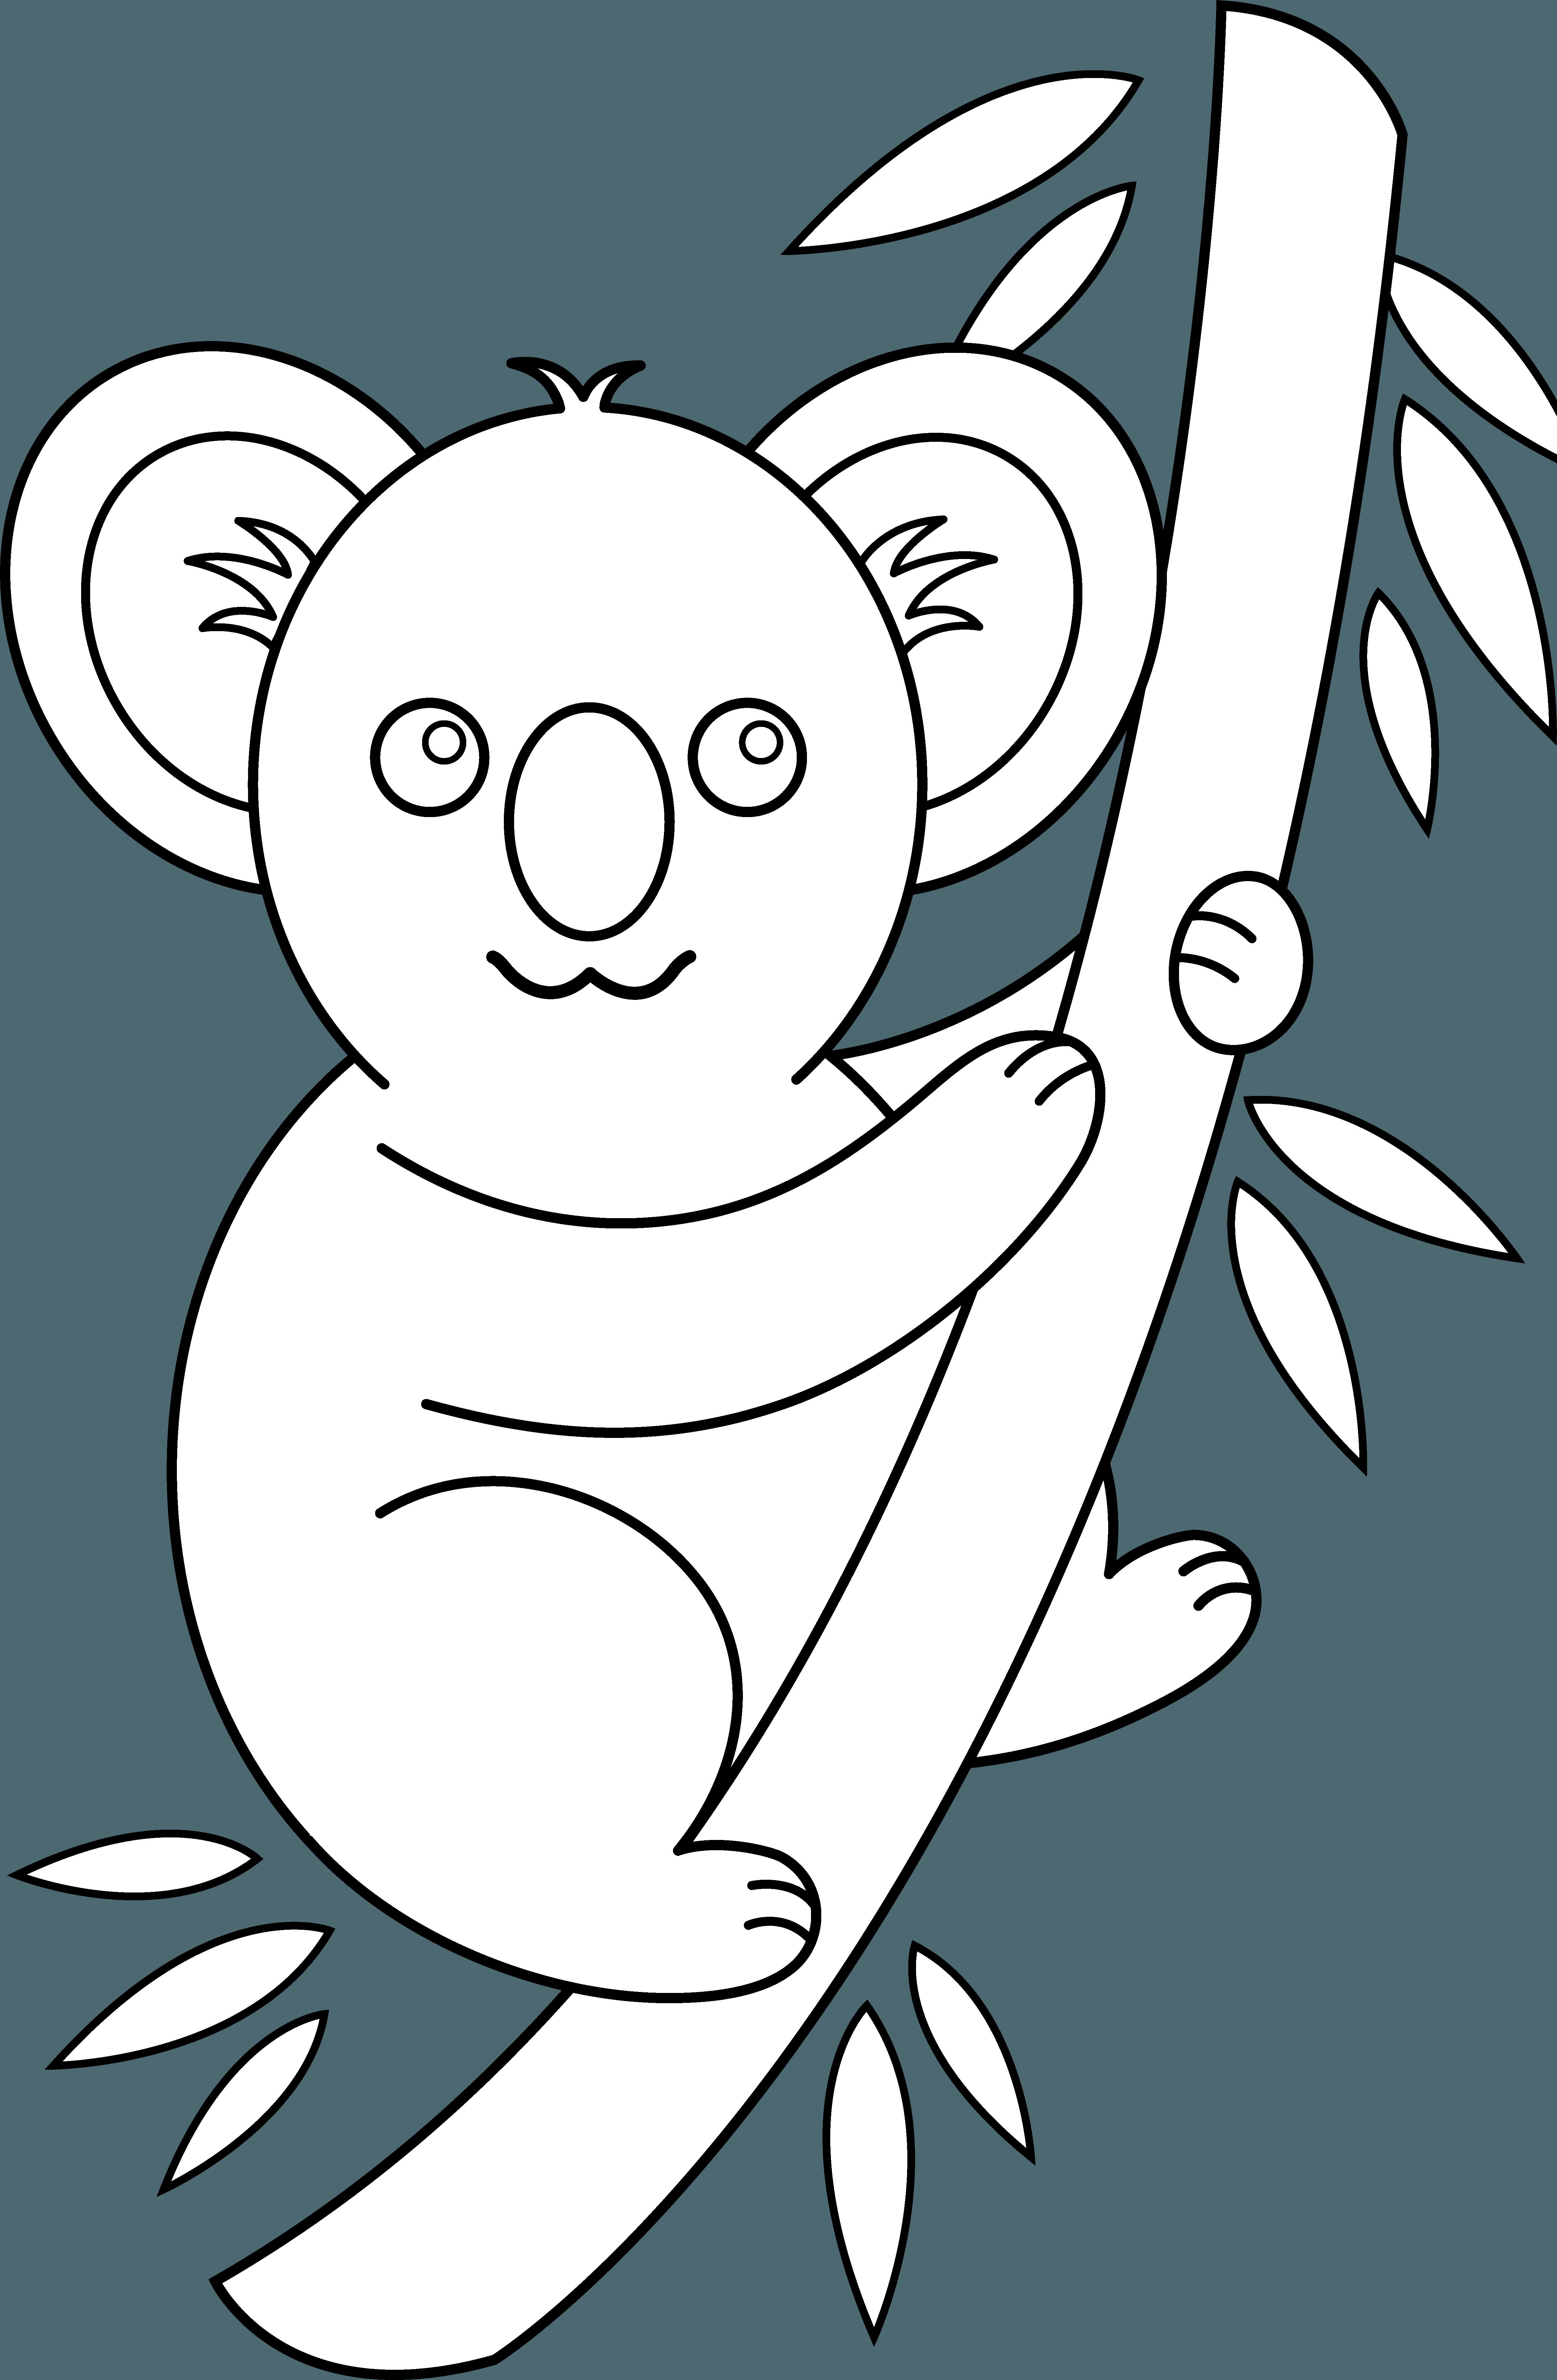 Outline group quoala bear. Koala clipart aussie